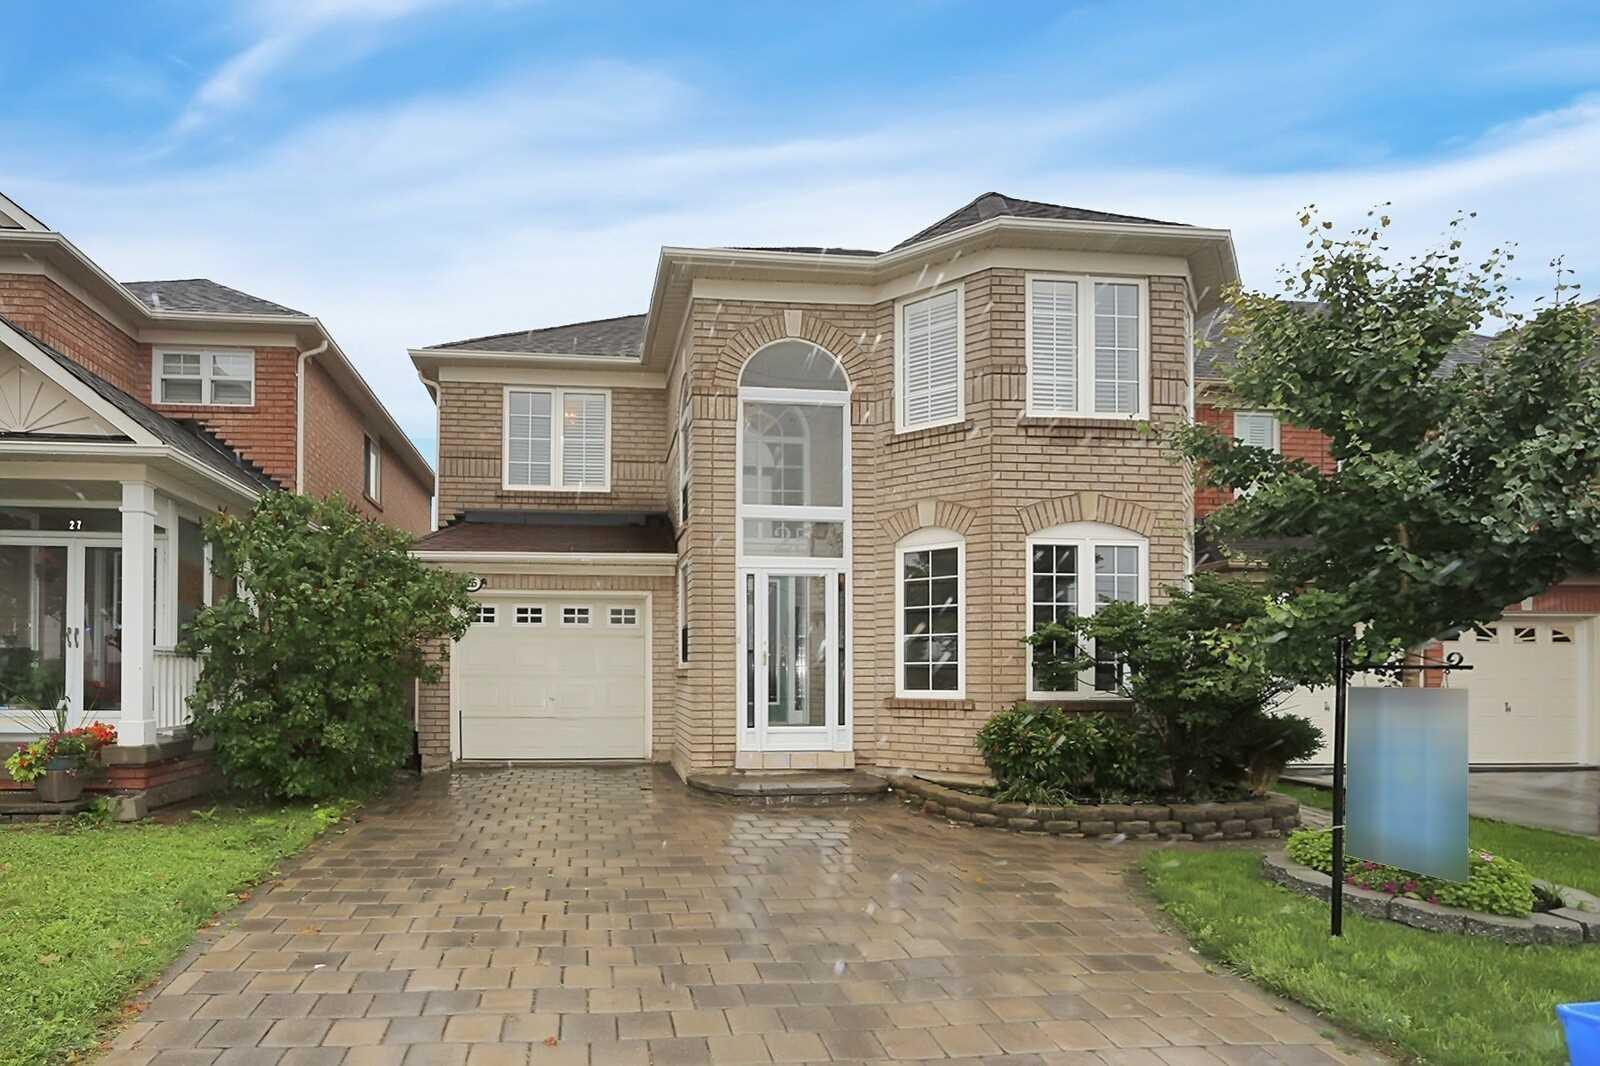 Detached house For Sale In Markham - 25 Tower Bridge Cres, Markham, Ontario, Canada L6C2M8 , 4 Bedrooms Bedrooms, ,4 BathroomsBathrooms,Detached,For Sale,Tower Bridge